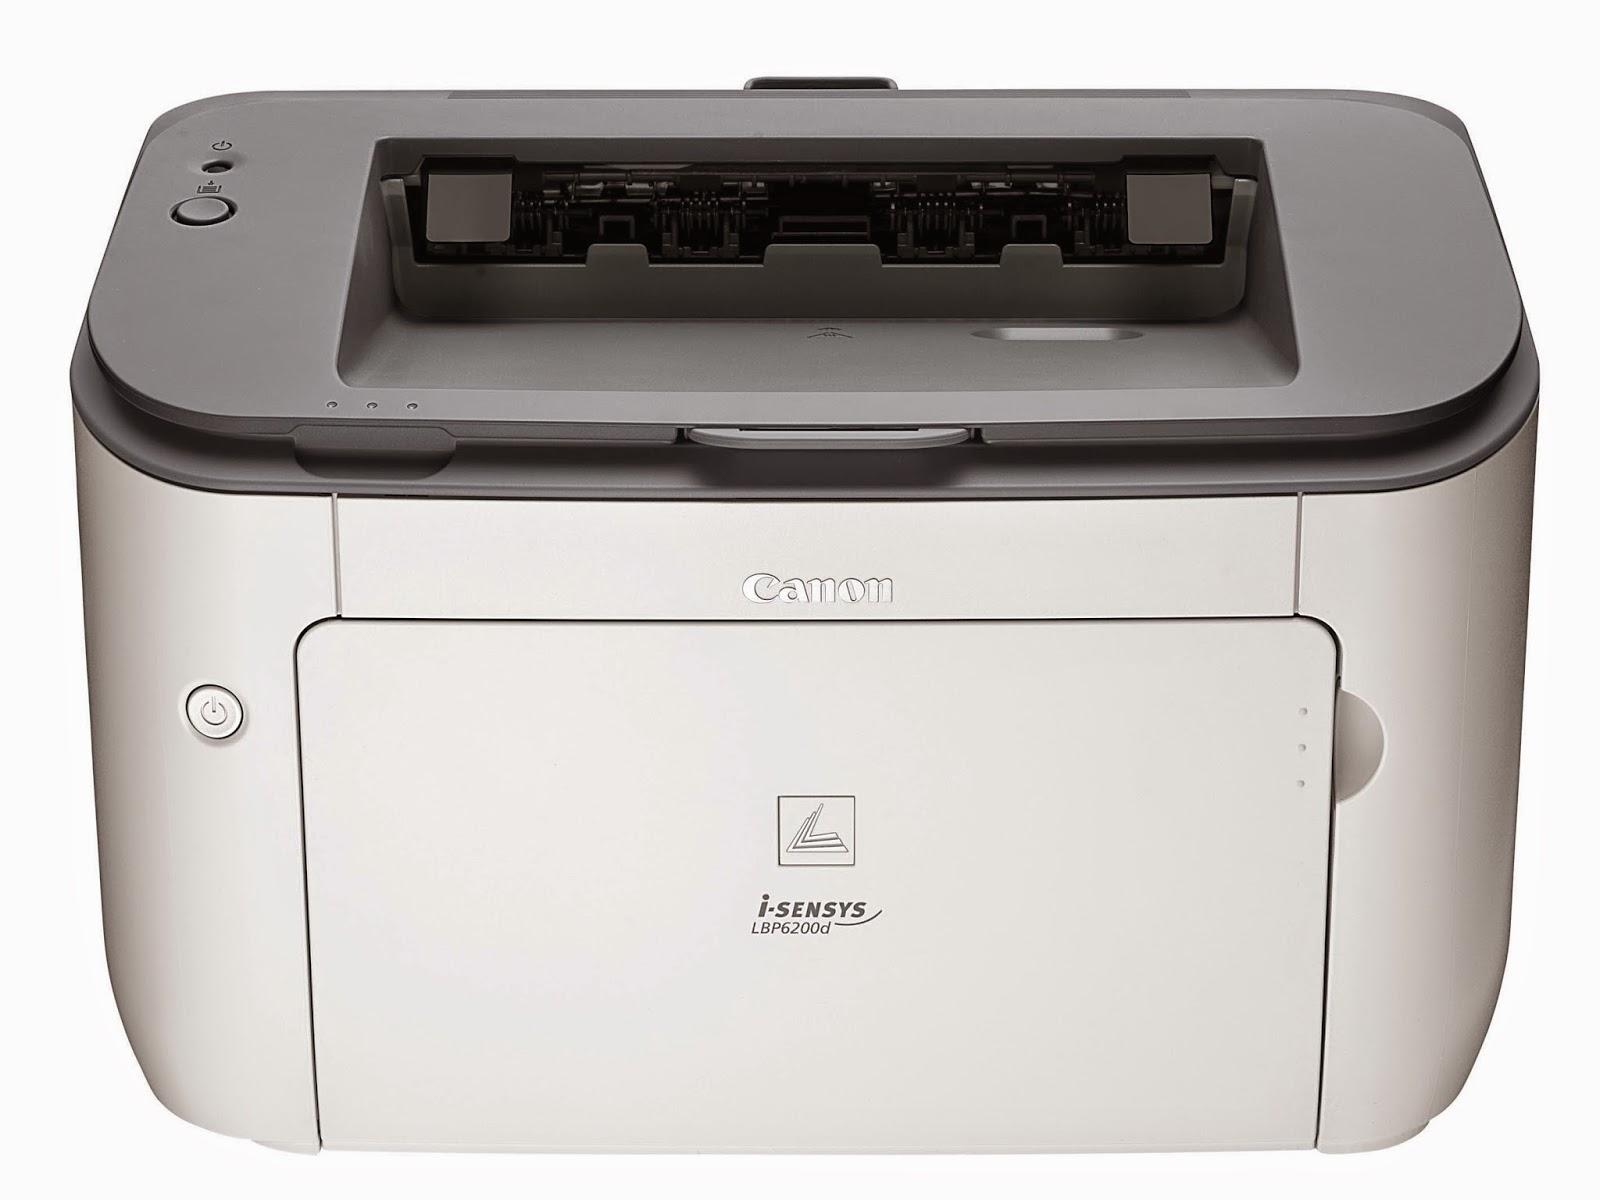 Canon ir3035 Drivers For mac machine